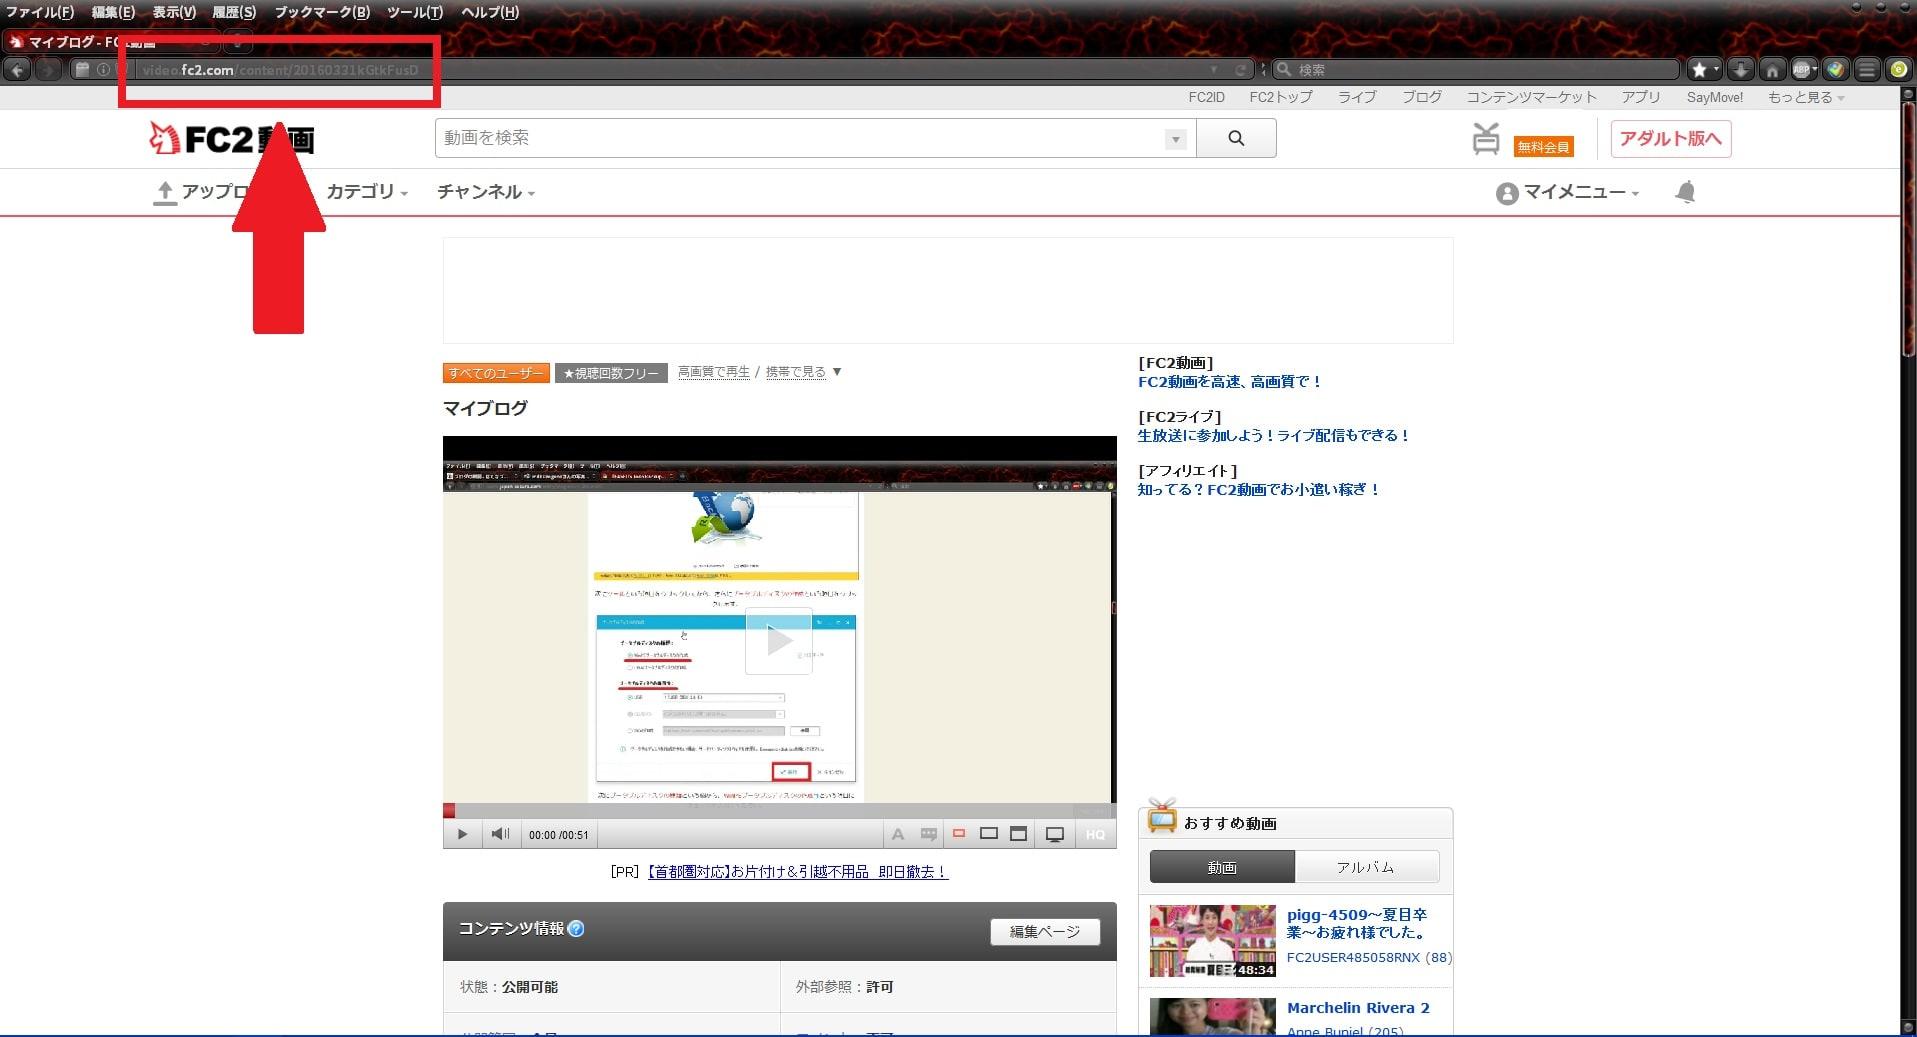 http://art1.photozou.jp/pub/119/2912119/photo/234957070_org.v1459415864.jpg